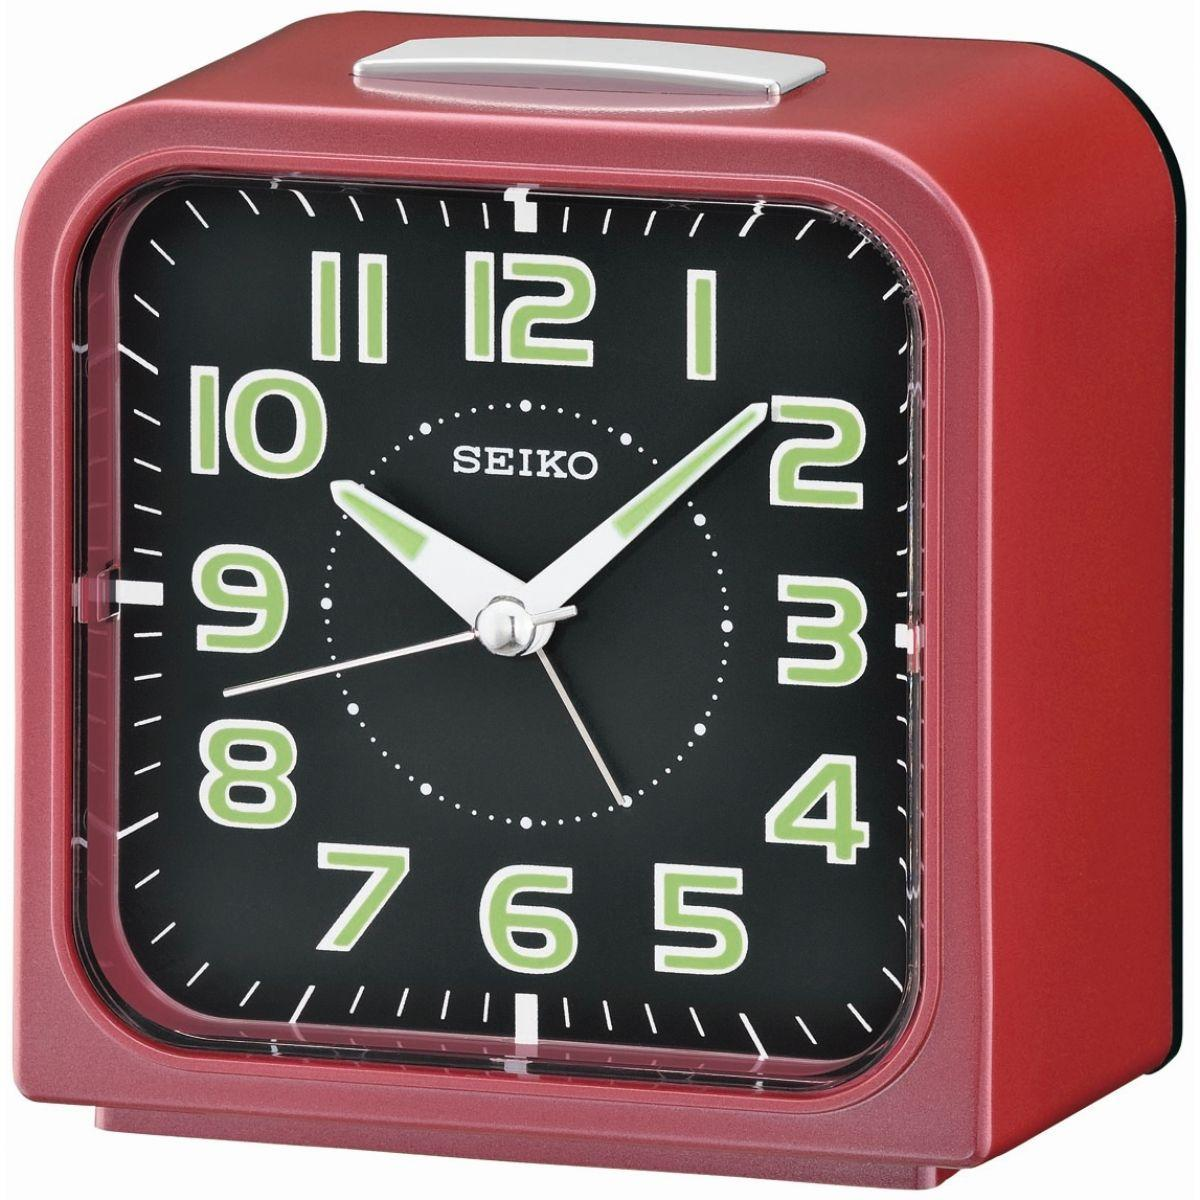 Seiko - Jam Meja Weker - Red - QHK025R Beker Alarm Original Cantik Unik Modern